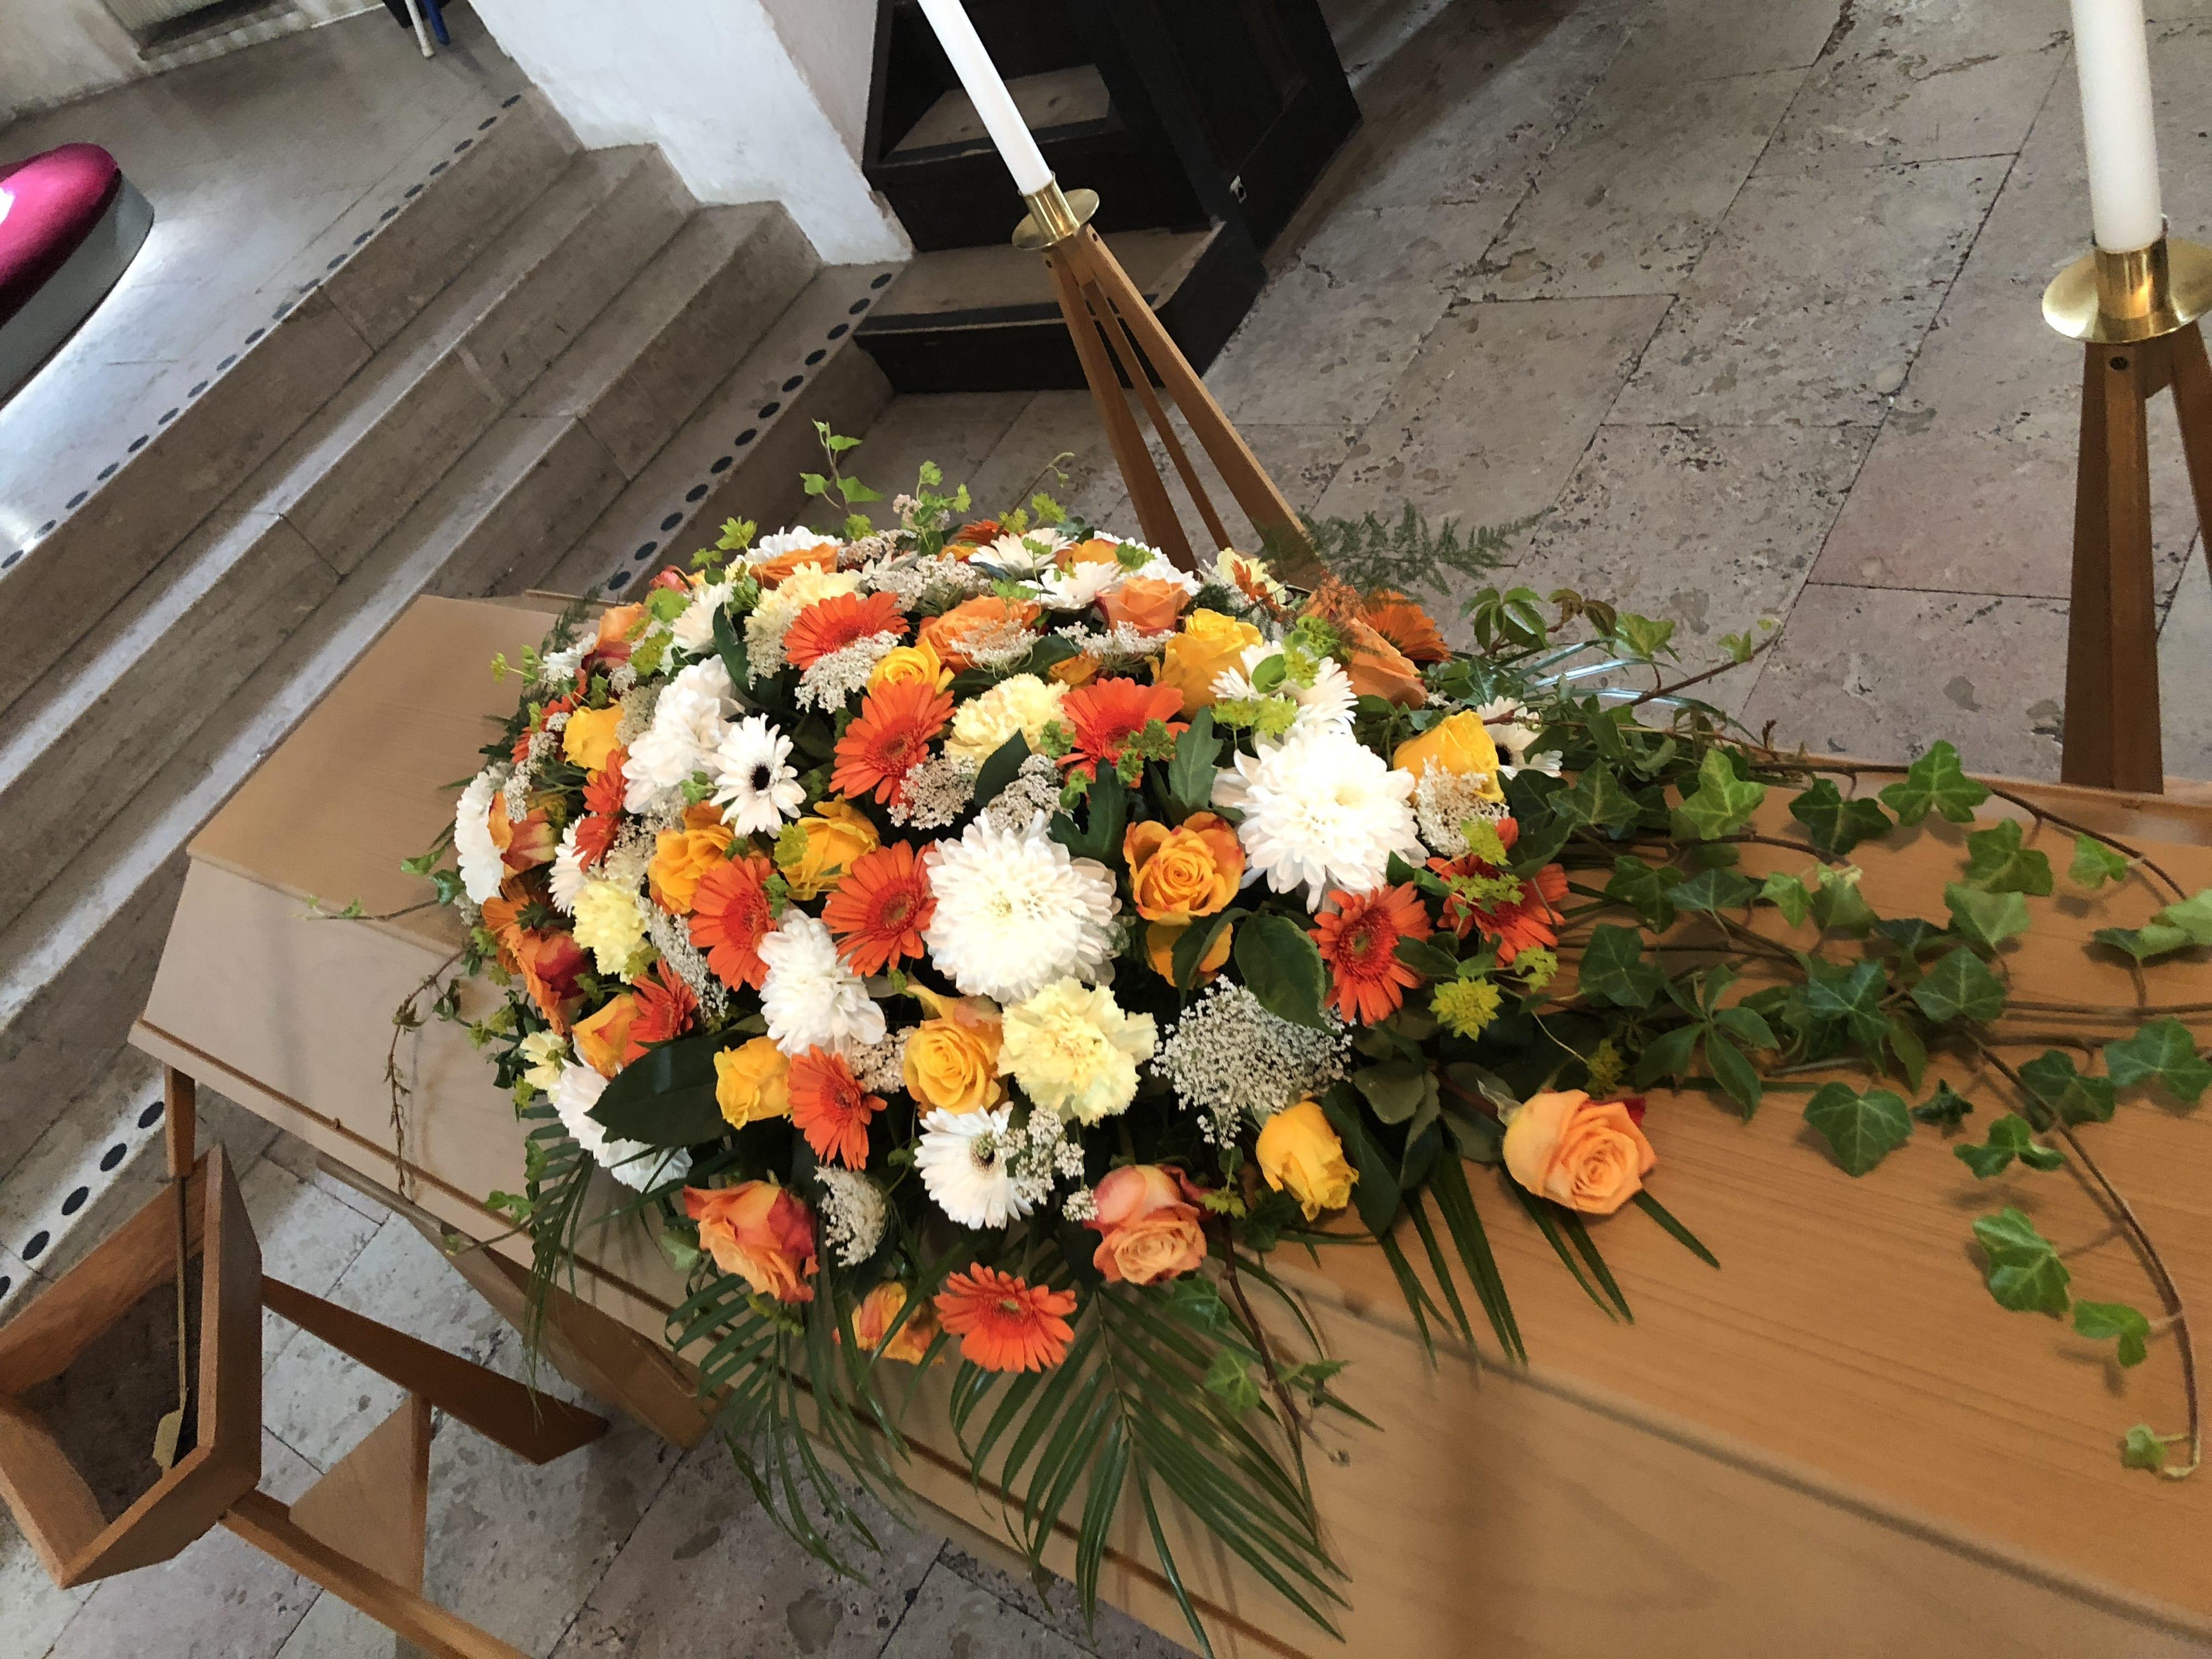 Blomsterbutiken Gardeco